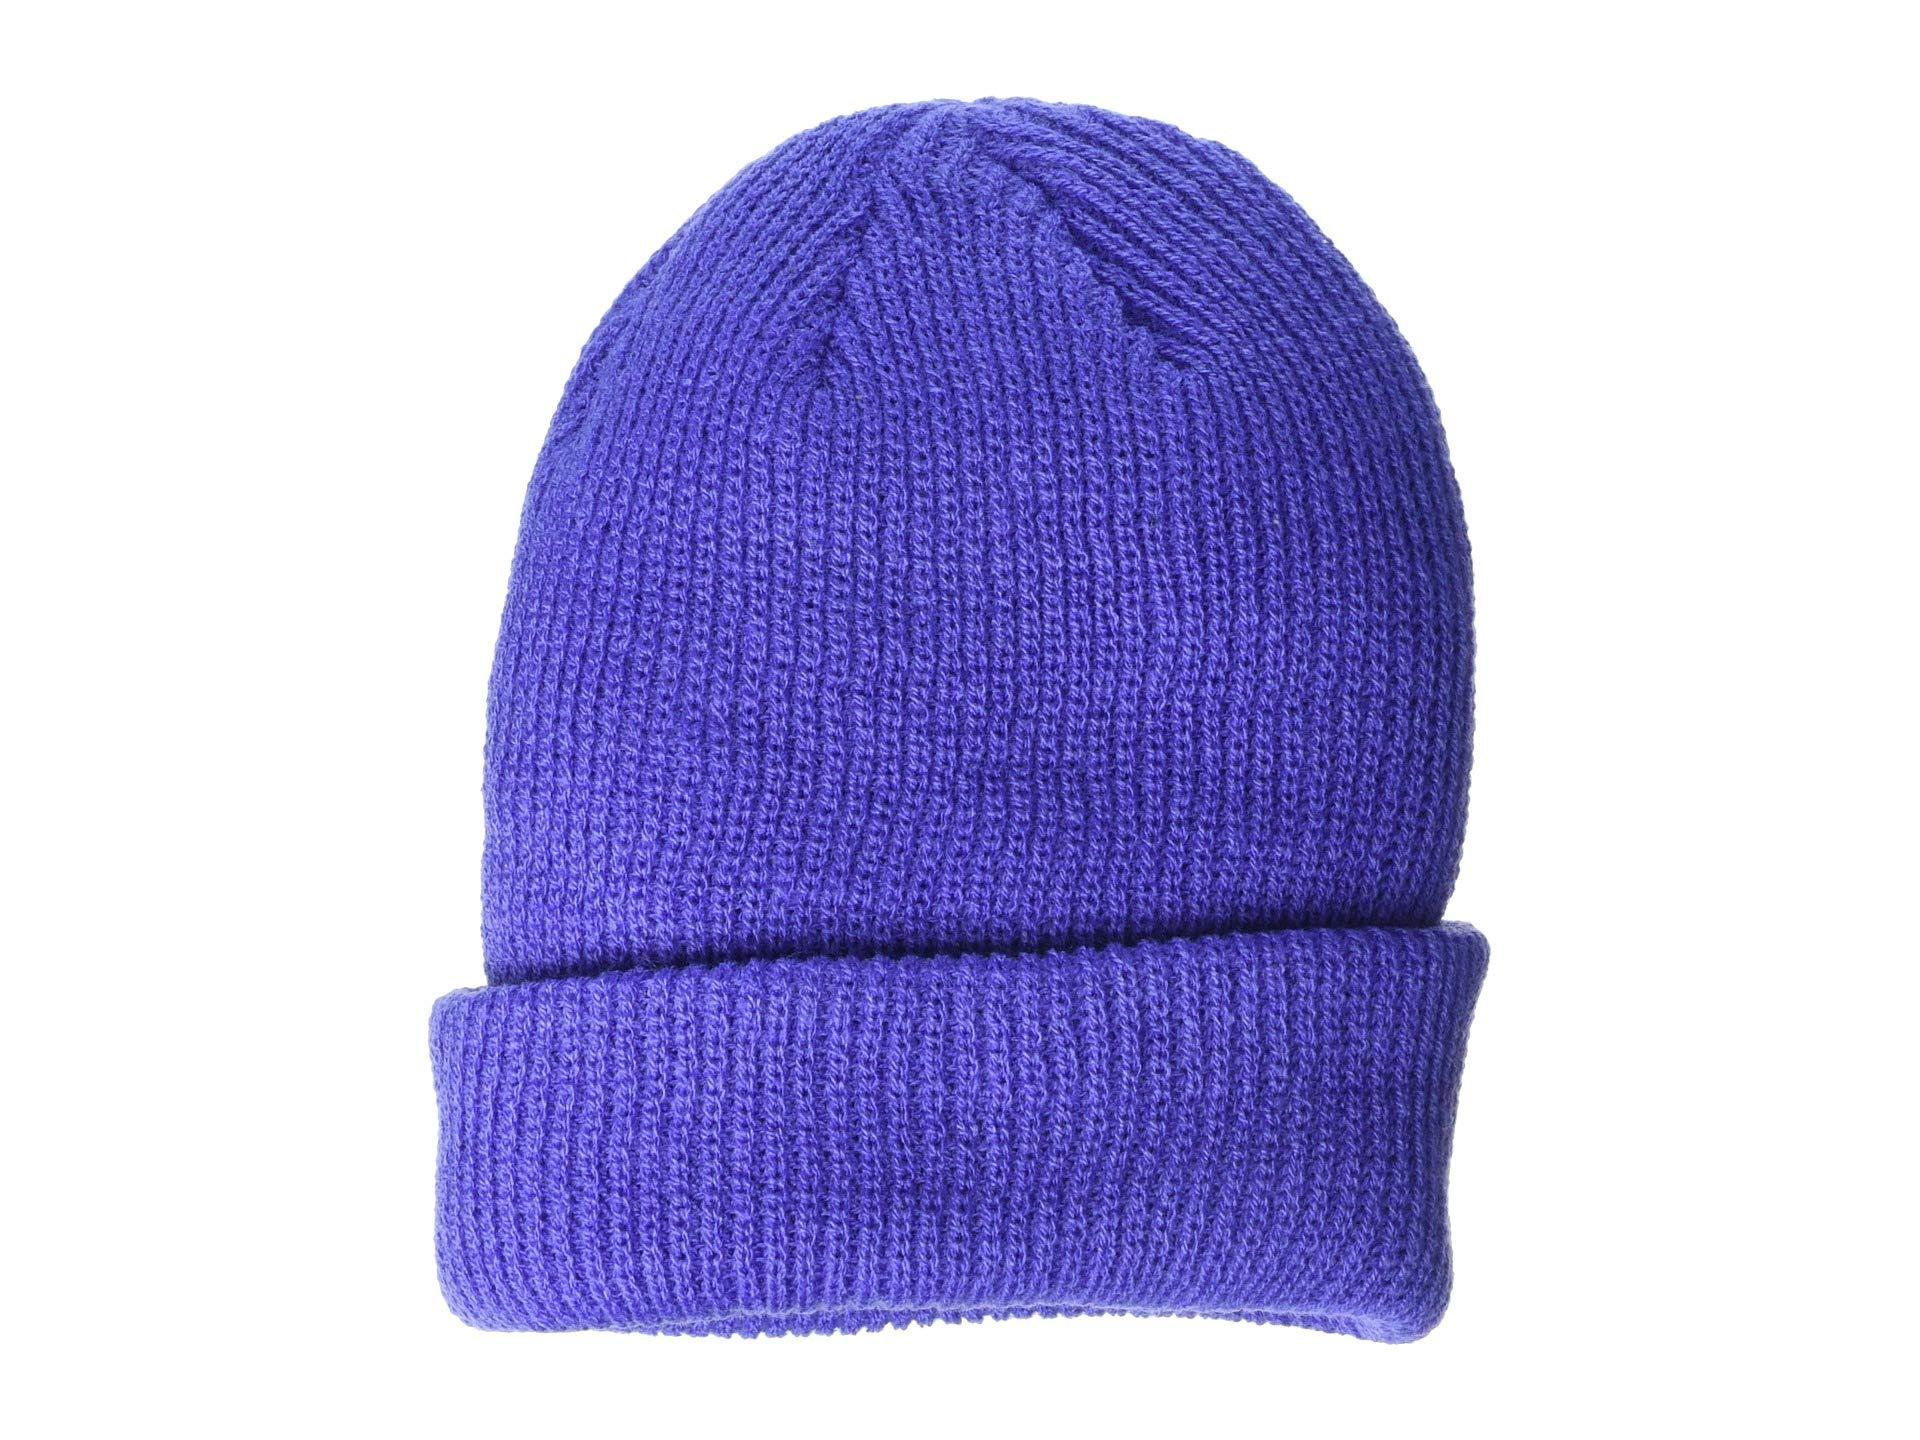 Lyst - Nike Fisherman Beanie in Purple for Men 99c7cb9c0fc9